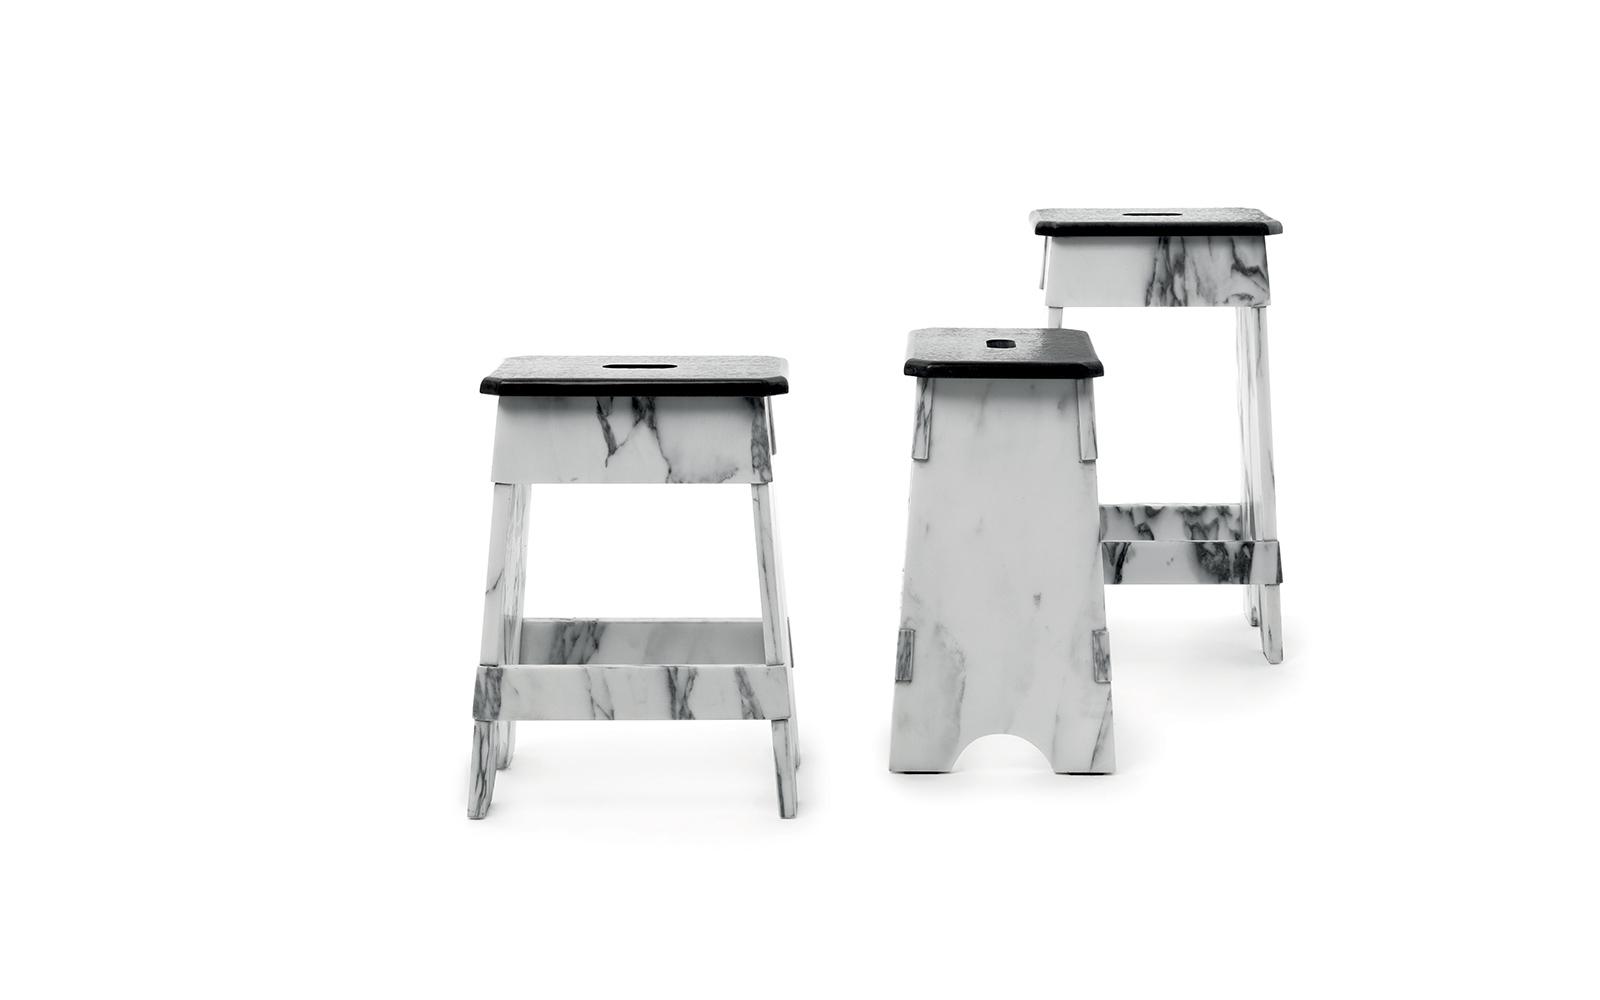 mogg_faas_seating_03.jpg